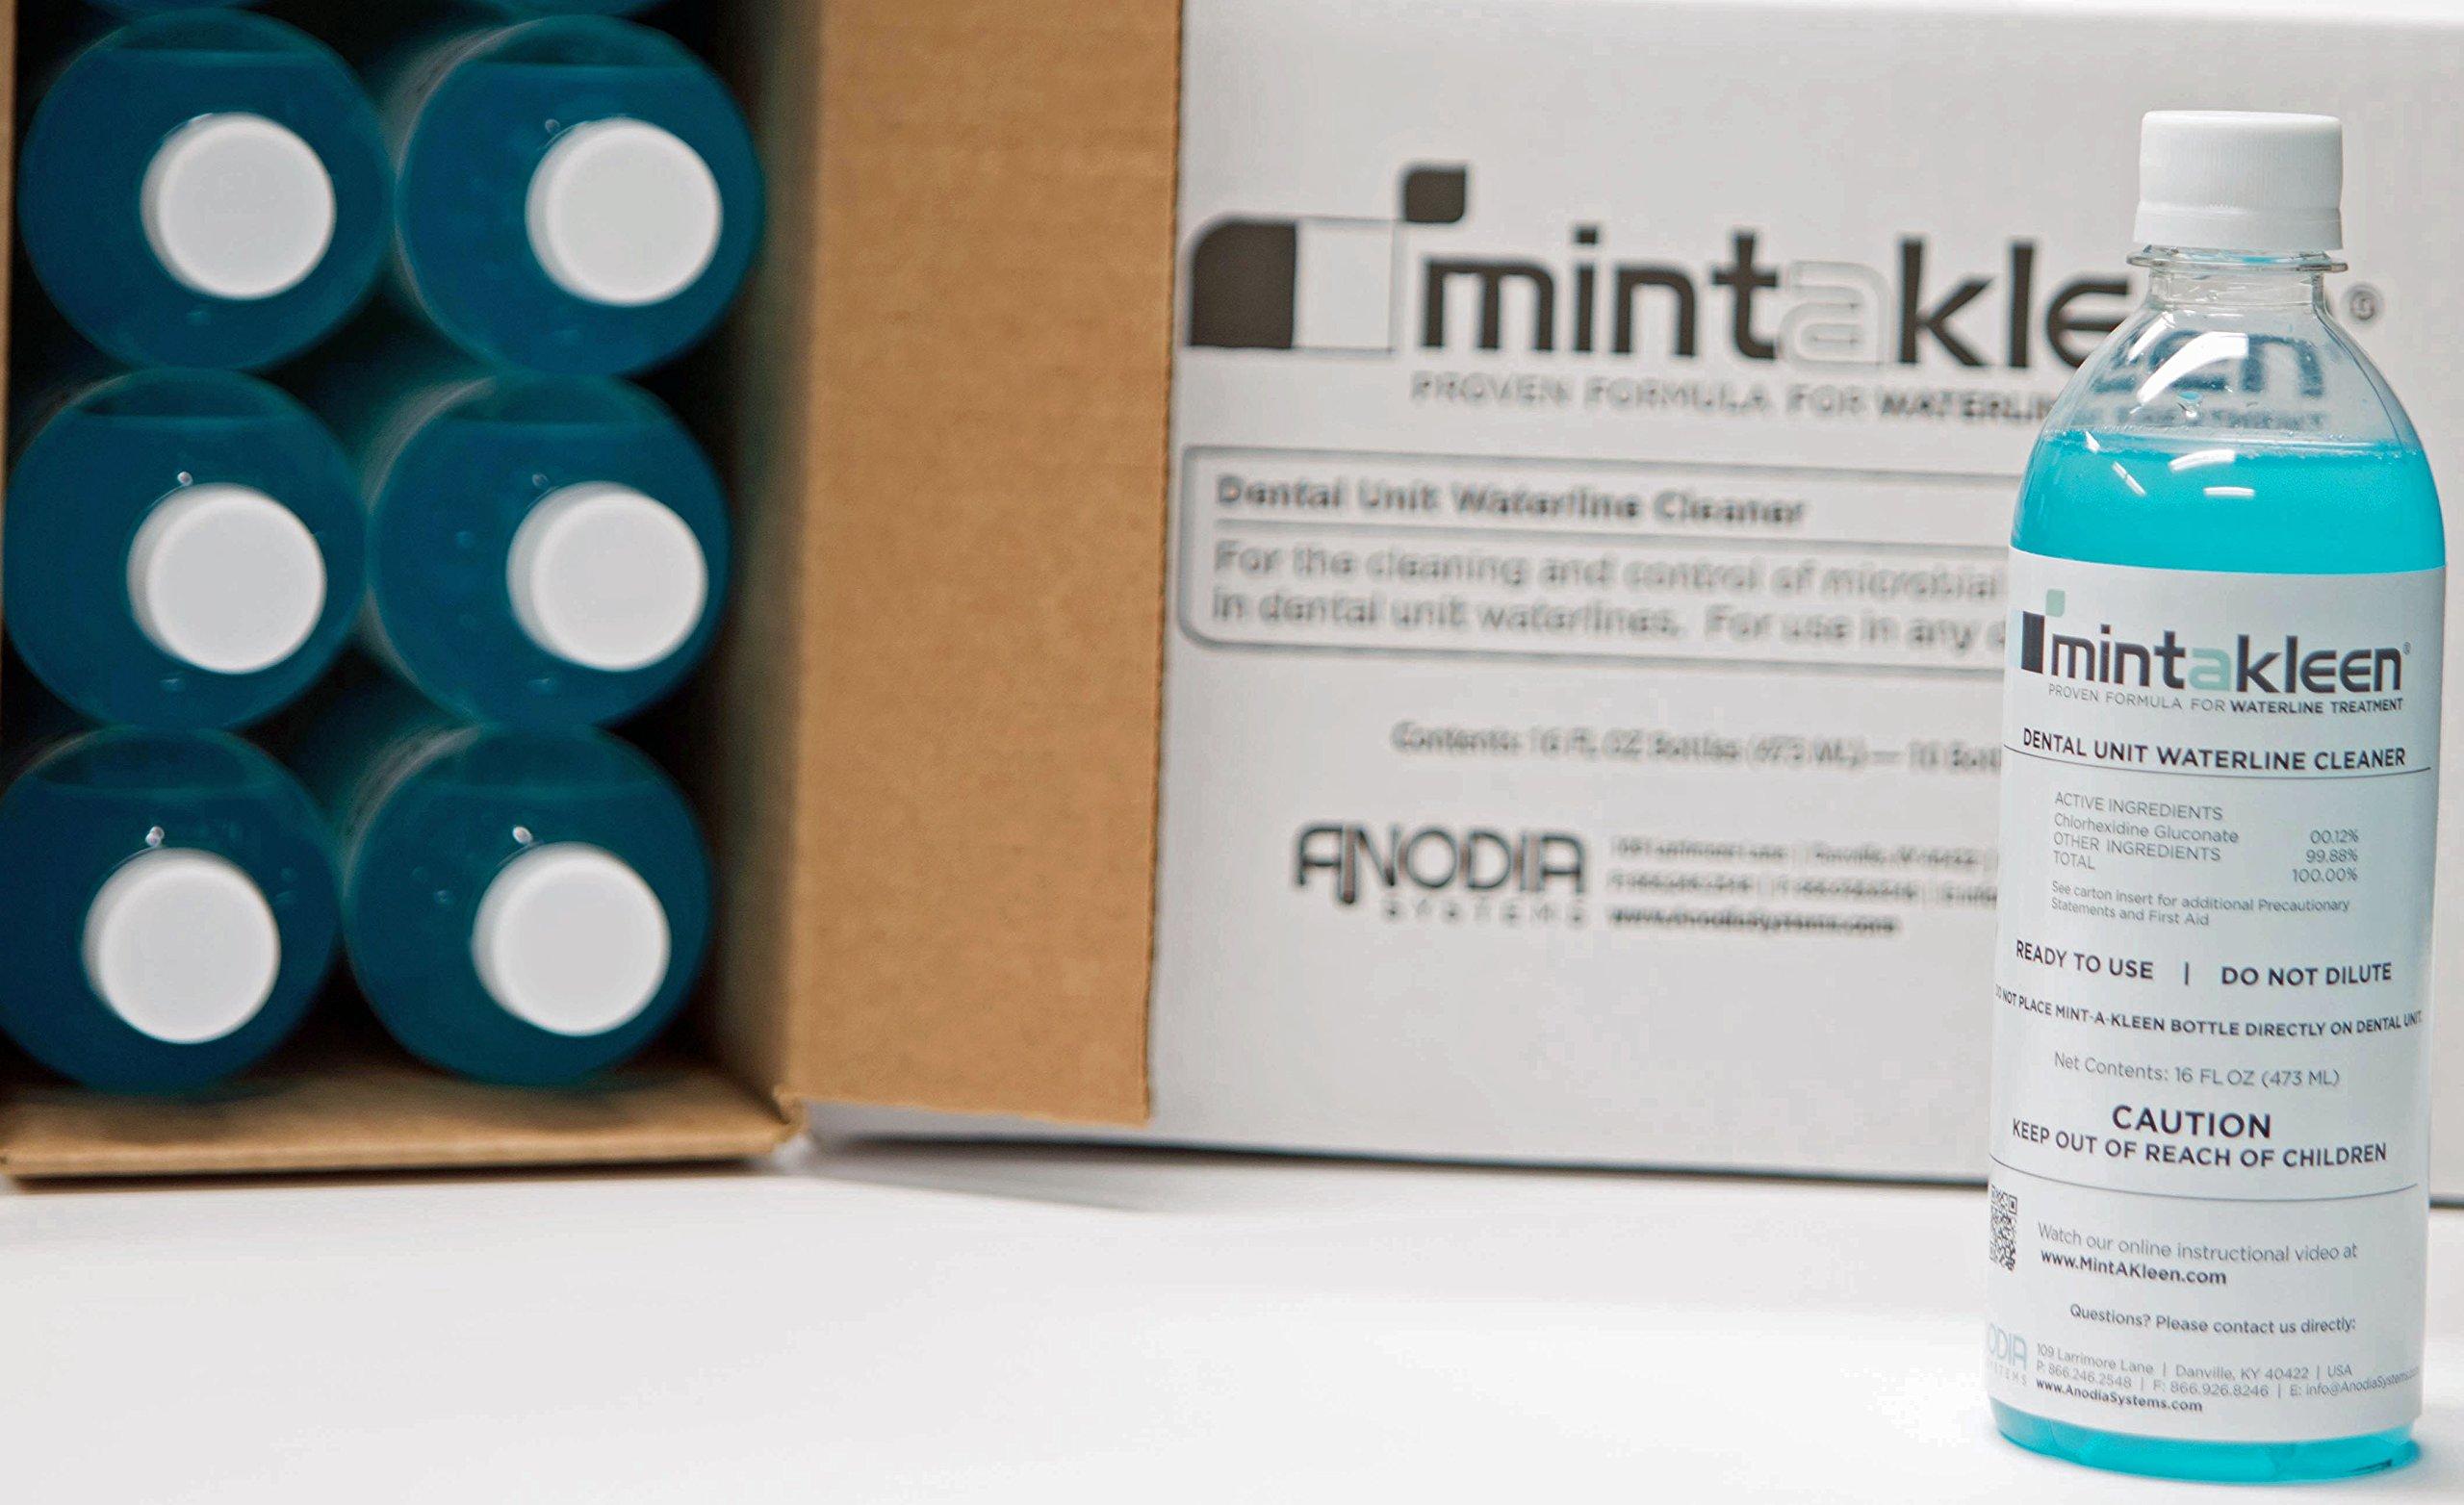 Mint-A-Kleen 6 Pack Dental Unit Waterline Cleaner MINTAKLEEN SIX 16 oz Bottles (24 Treatments)